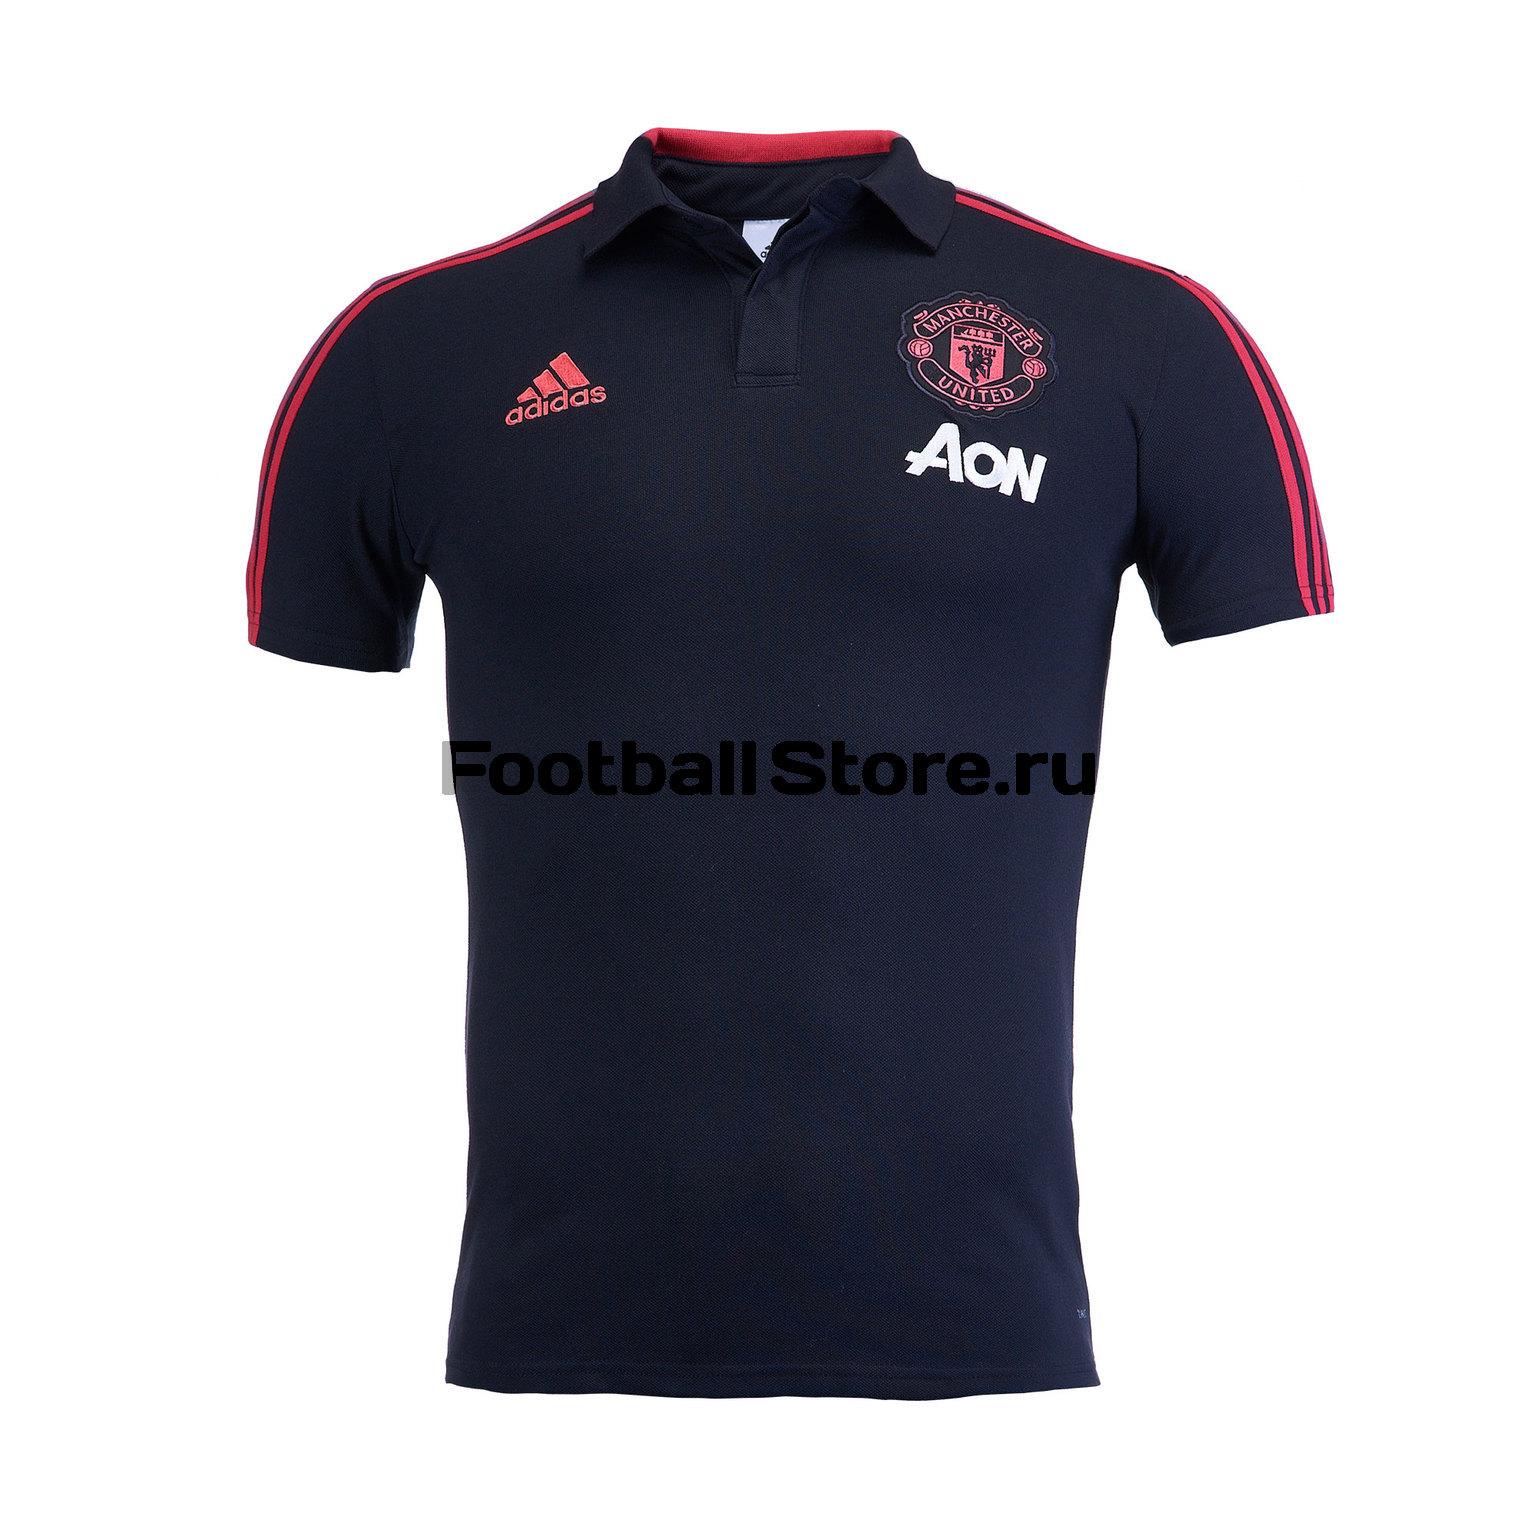 Рубашка-поло Adidas Manchester United 2018/19 рюкзак adidas manchester united cy5581